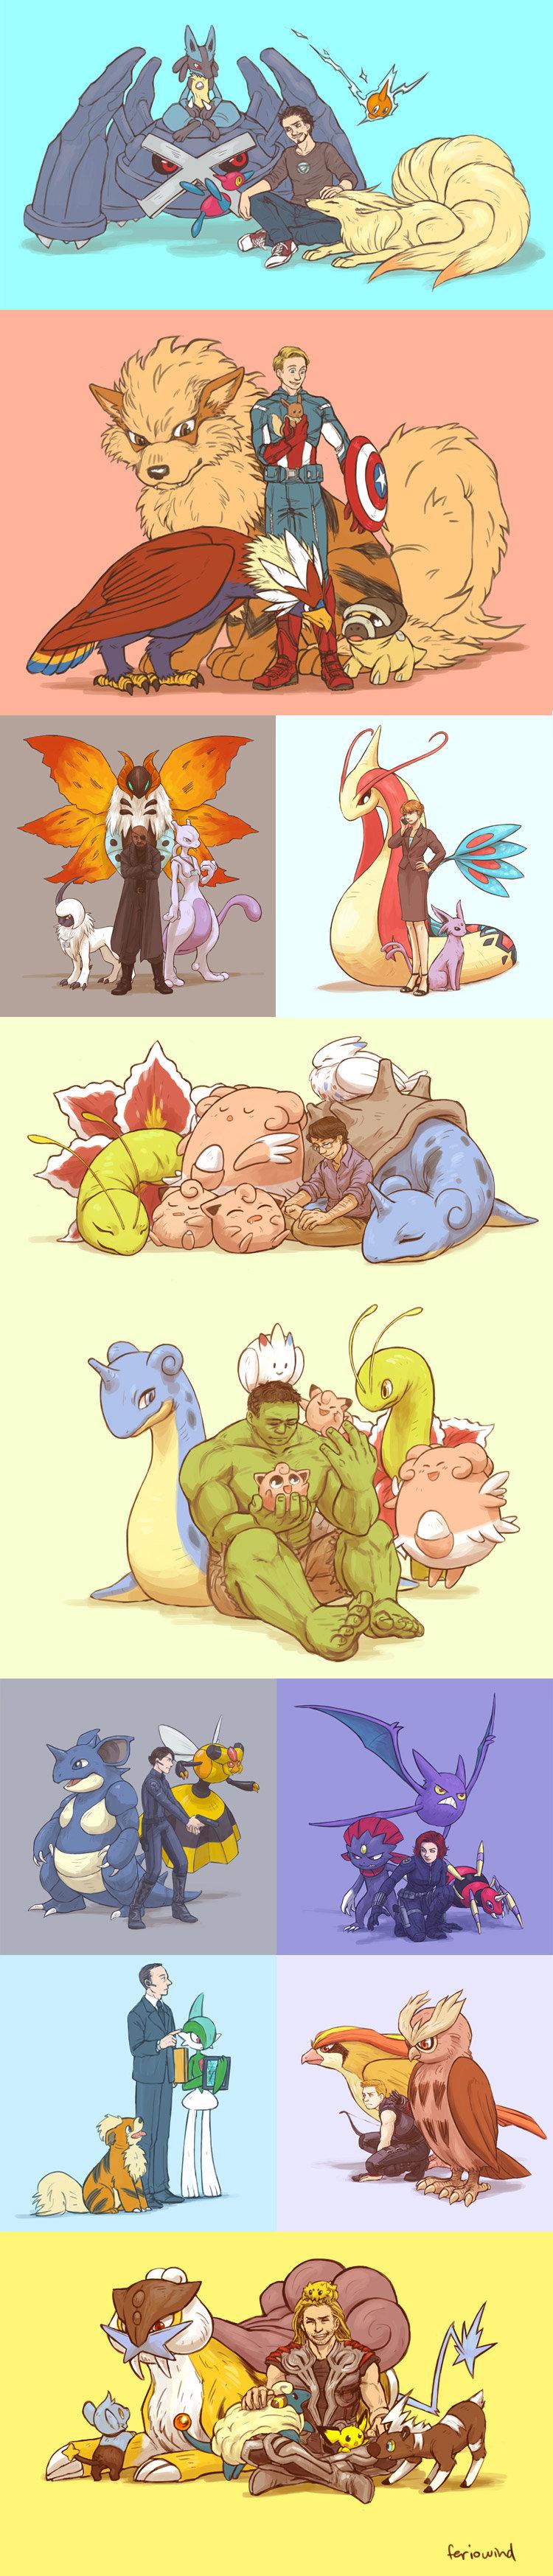 Avengers' Pokémon Assemble!. source: feriowind.deviantart.com/gallery/38002142.